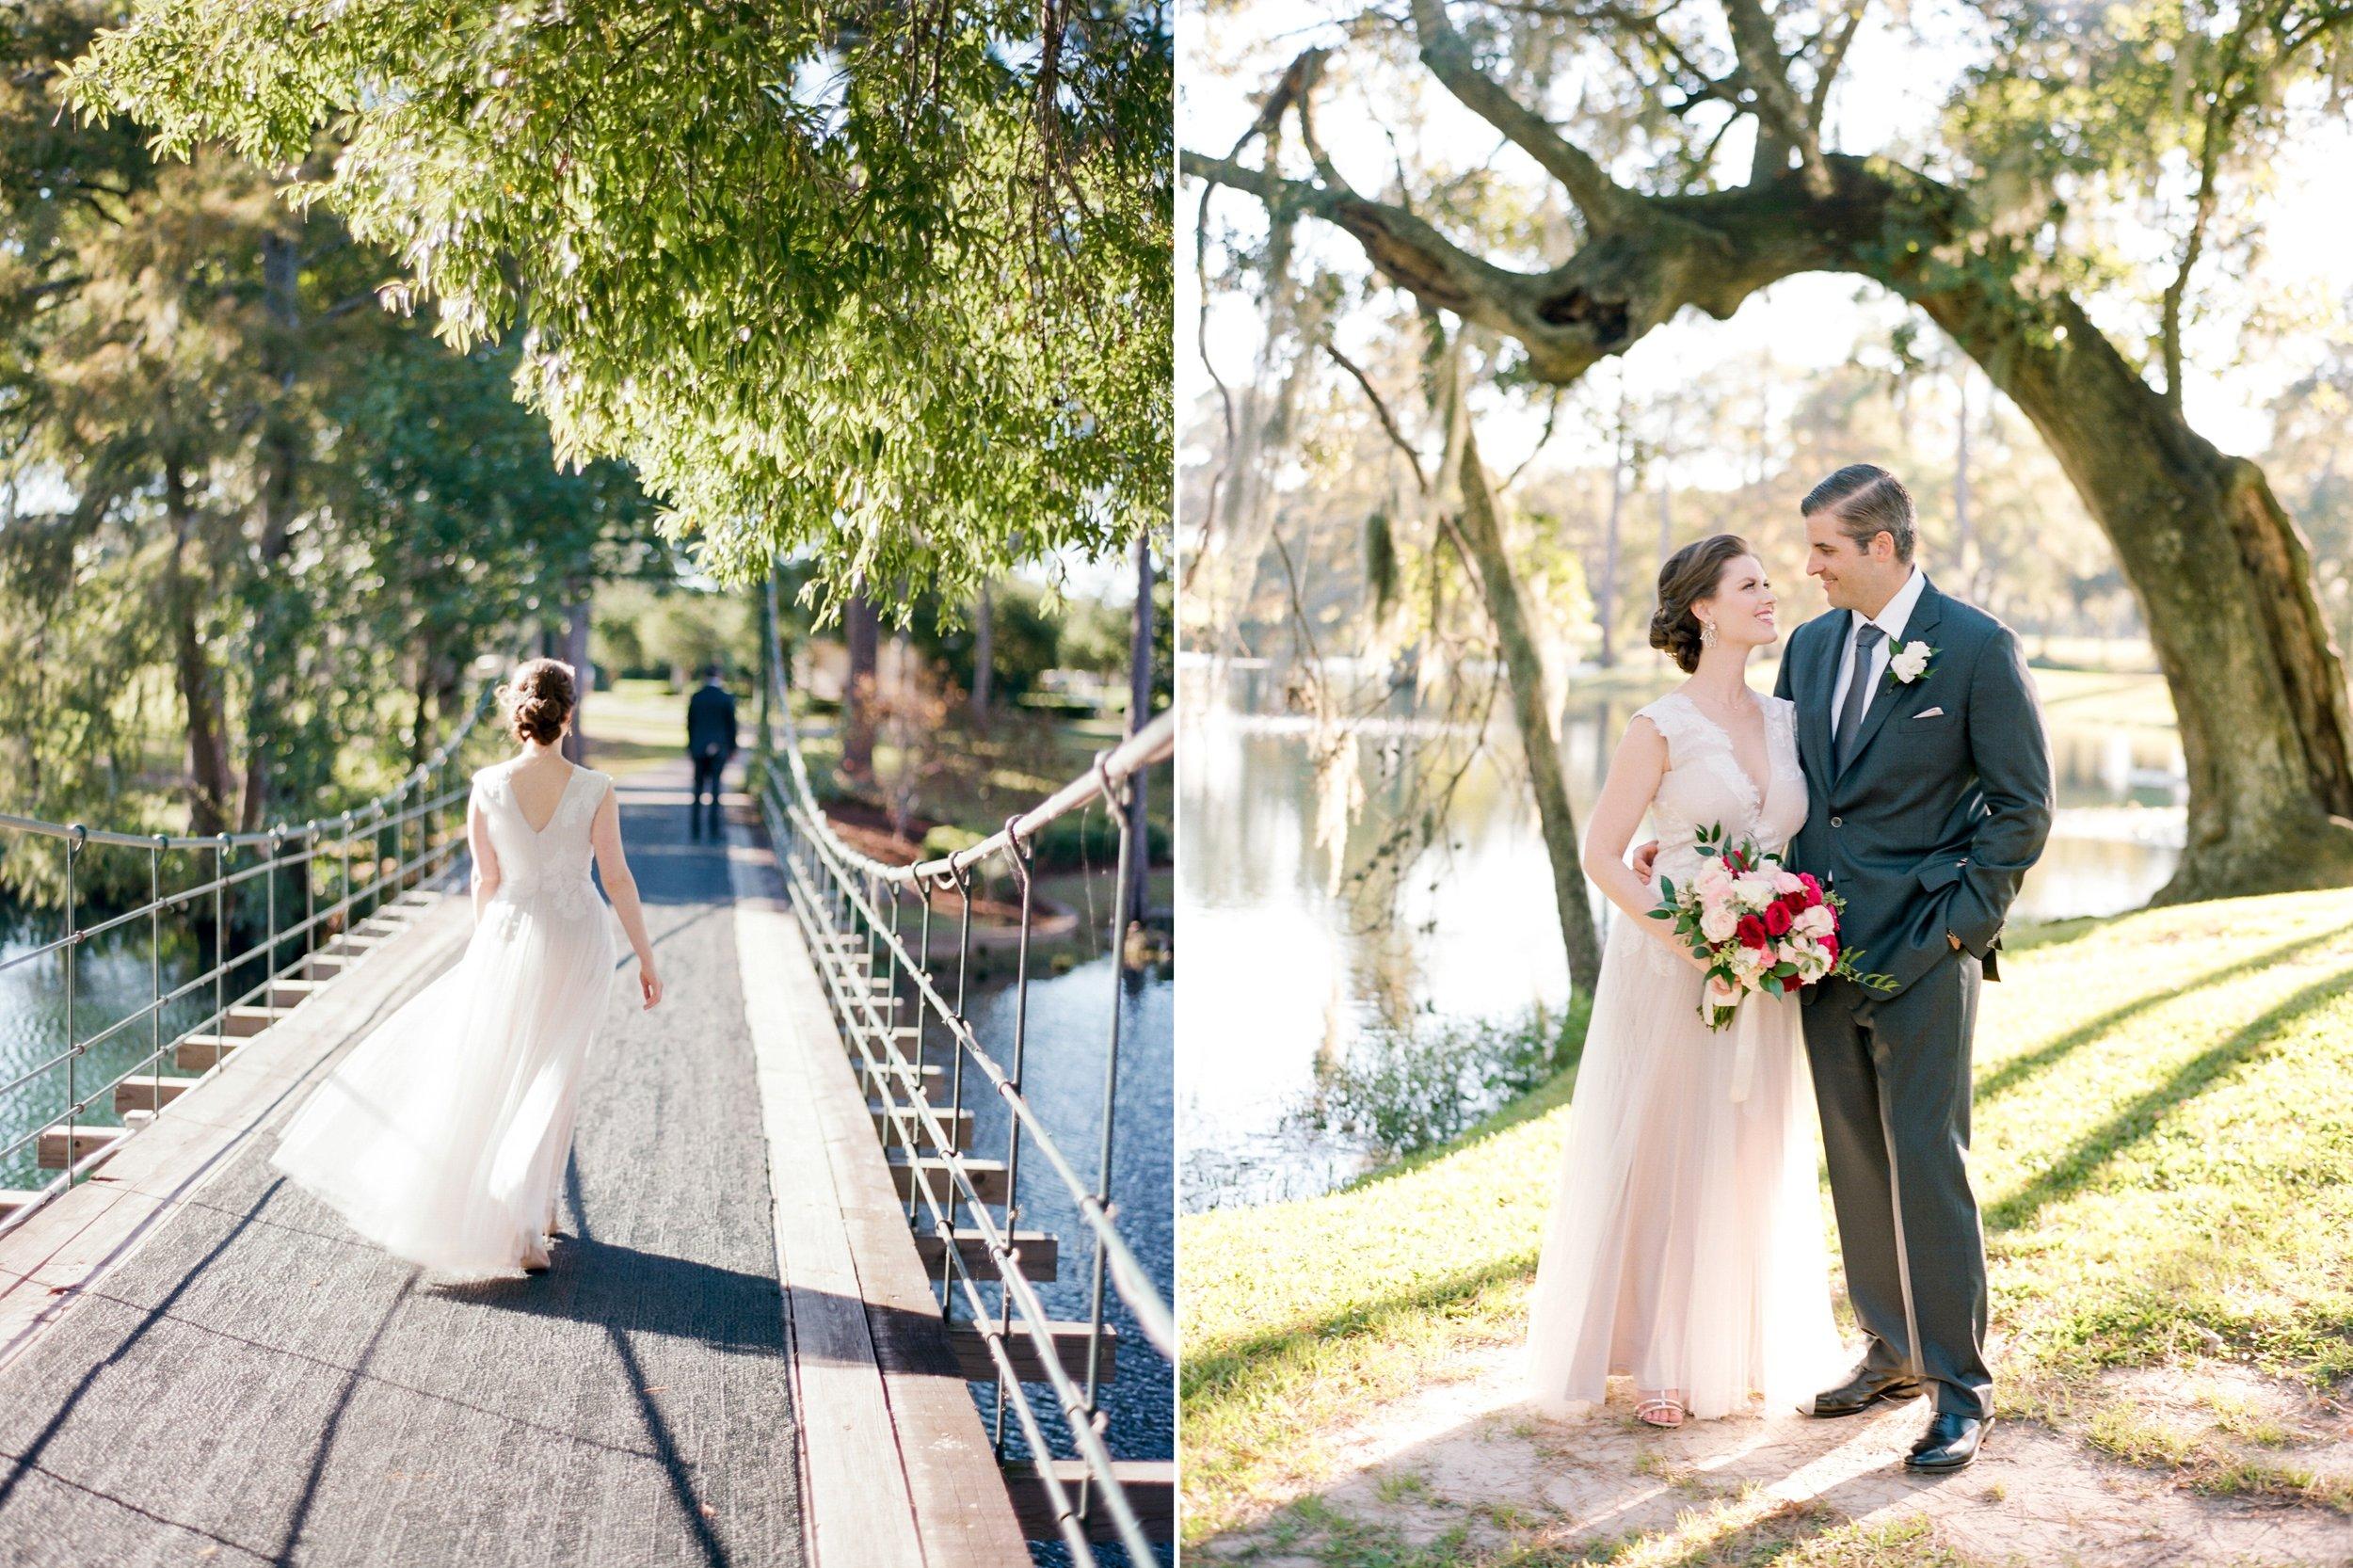 Houston-Wedding-Photographer-Lakeside-Country-Club-First-Look-Bride-Groom-Formals-Film-Fine-Art-Photography-4204.jpg